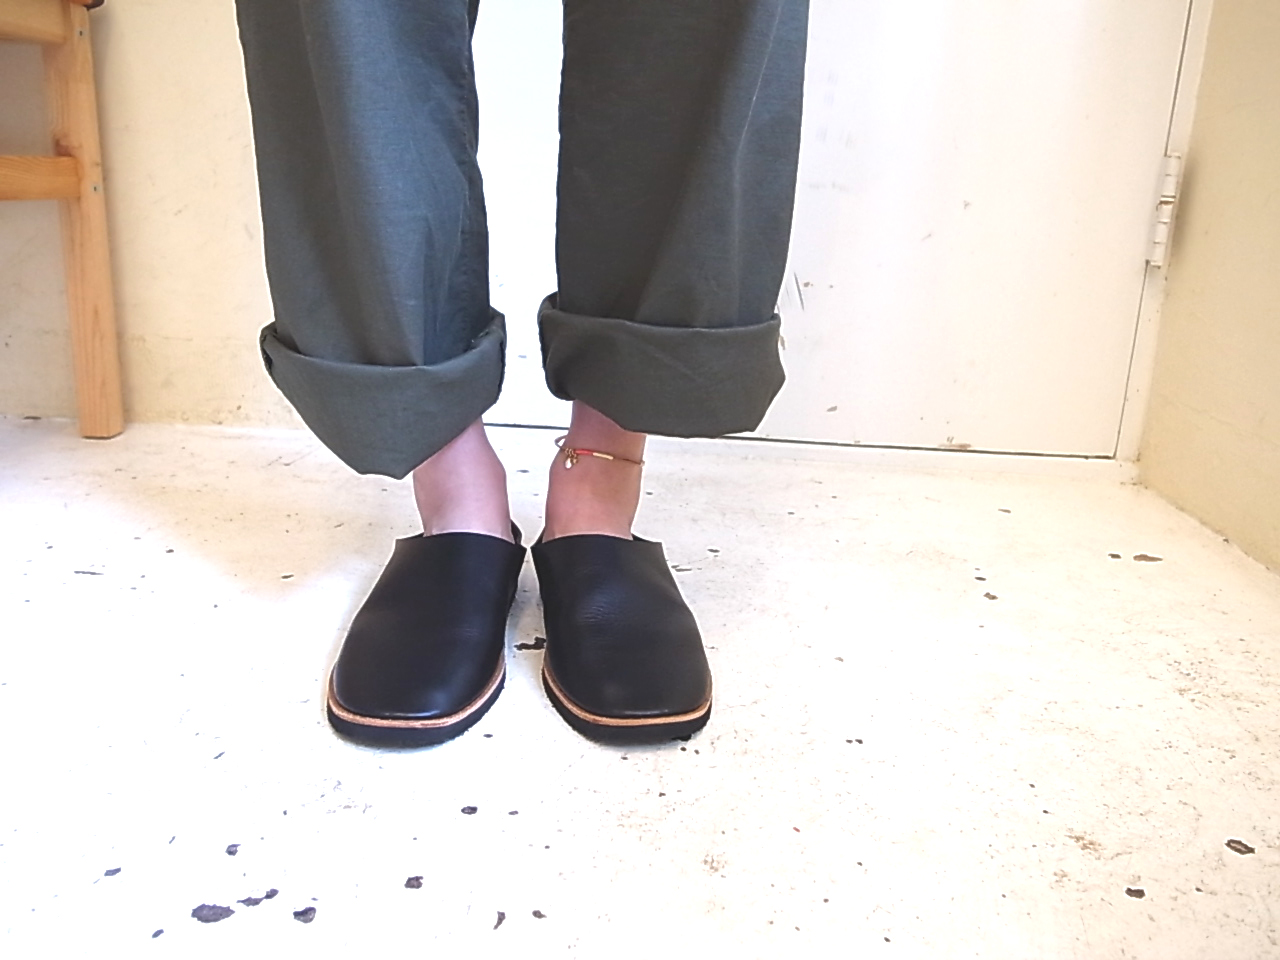 sabot shoes